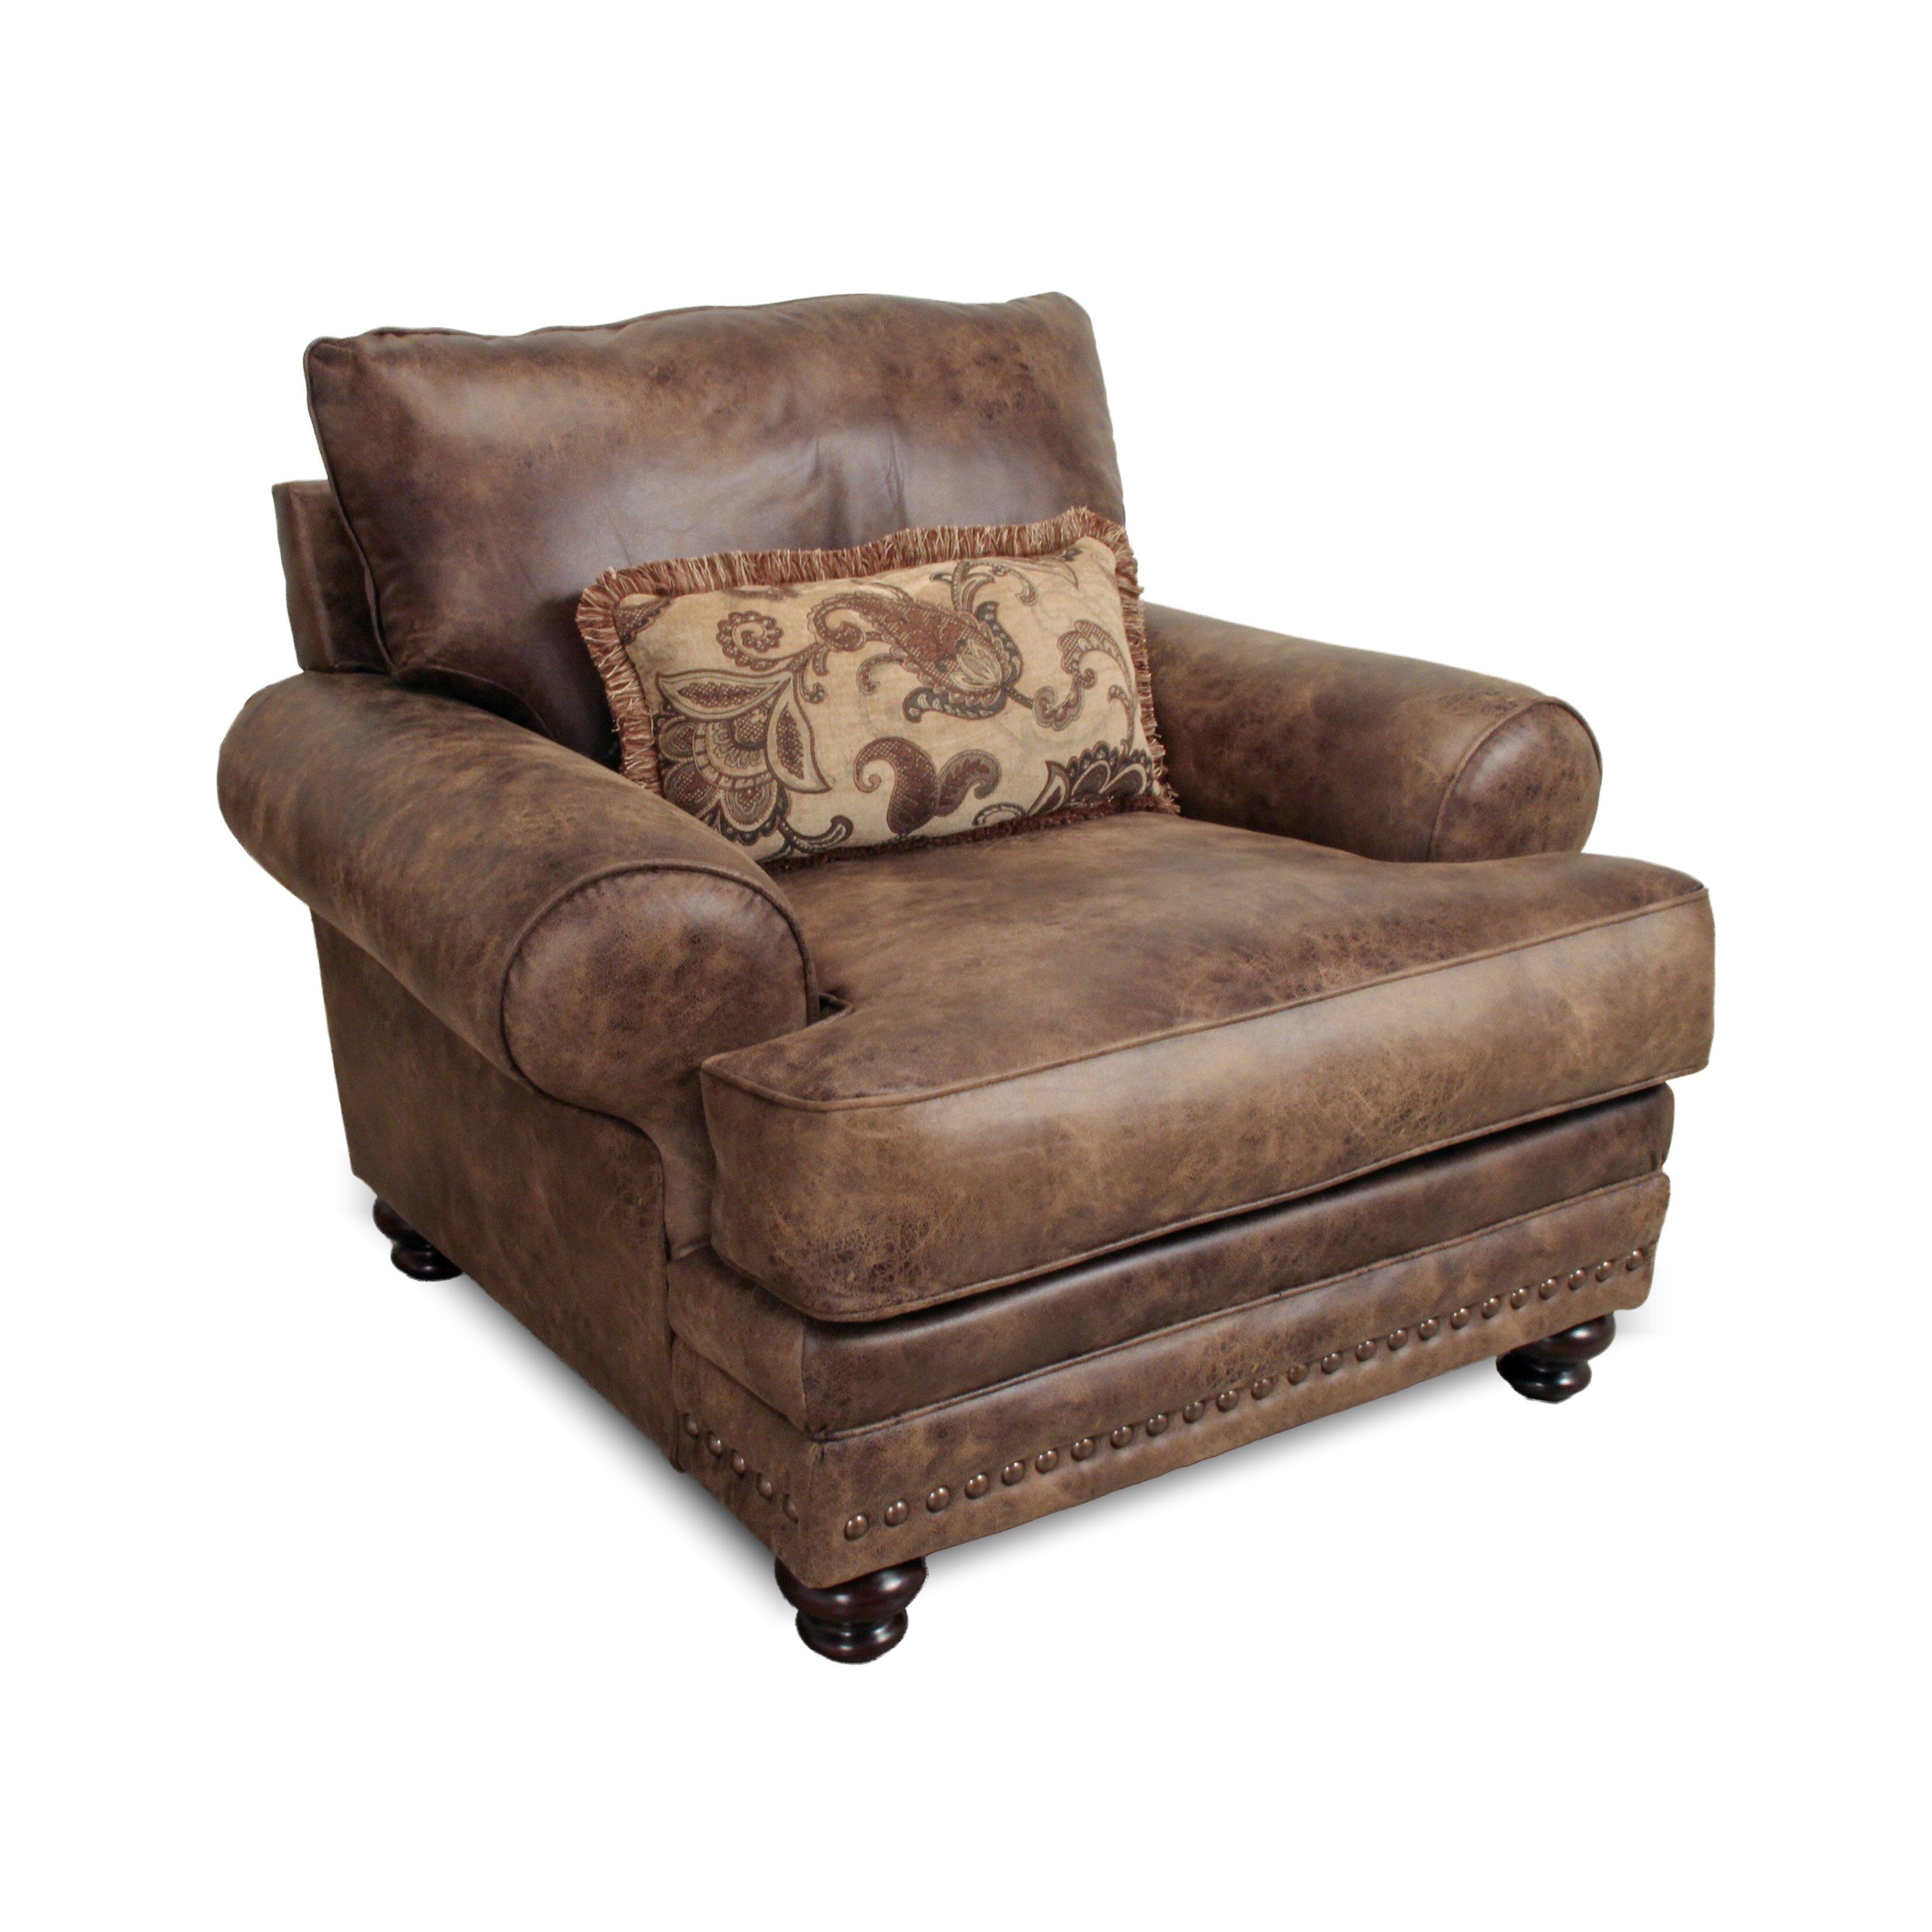 Loon Peak Claremore Chair And A Half Amp Reviews Wayfair Ca